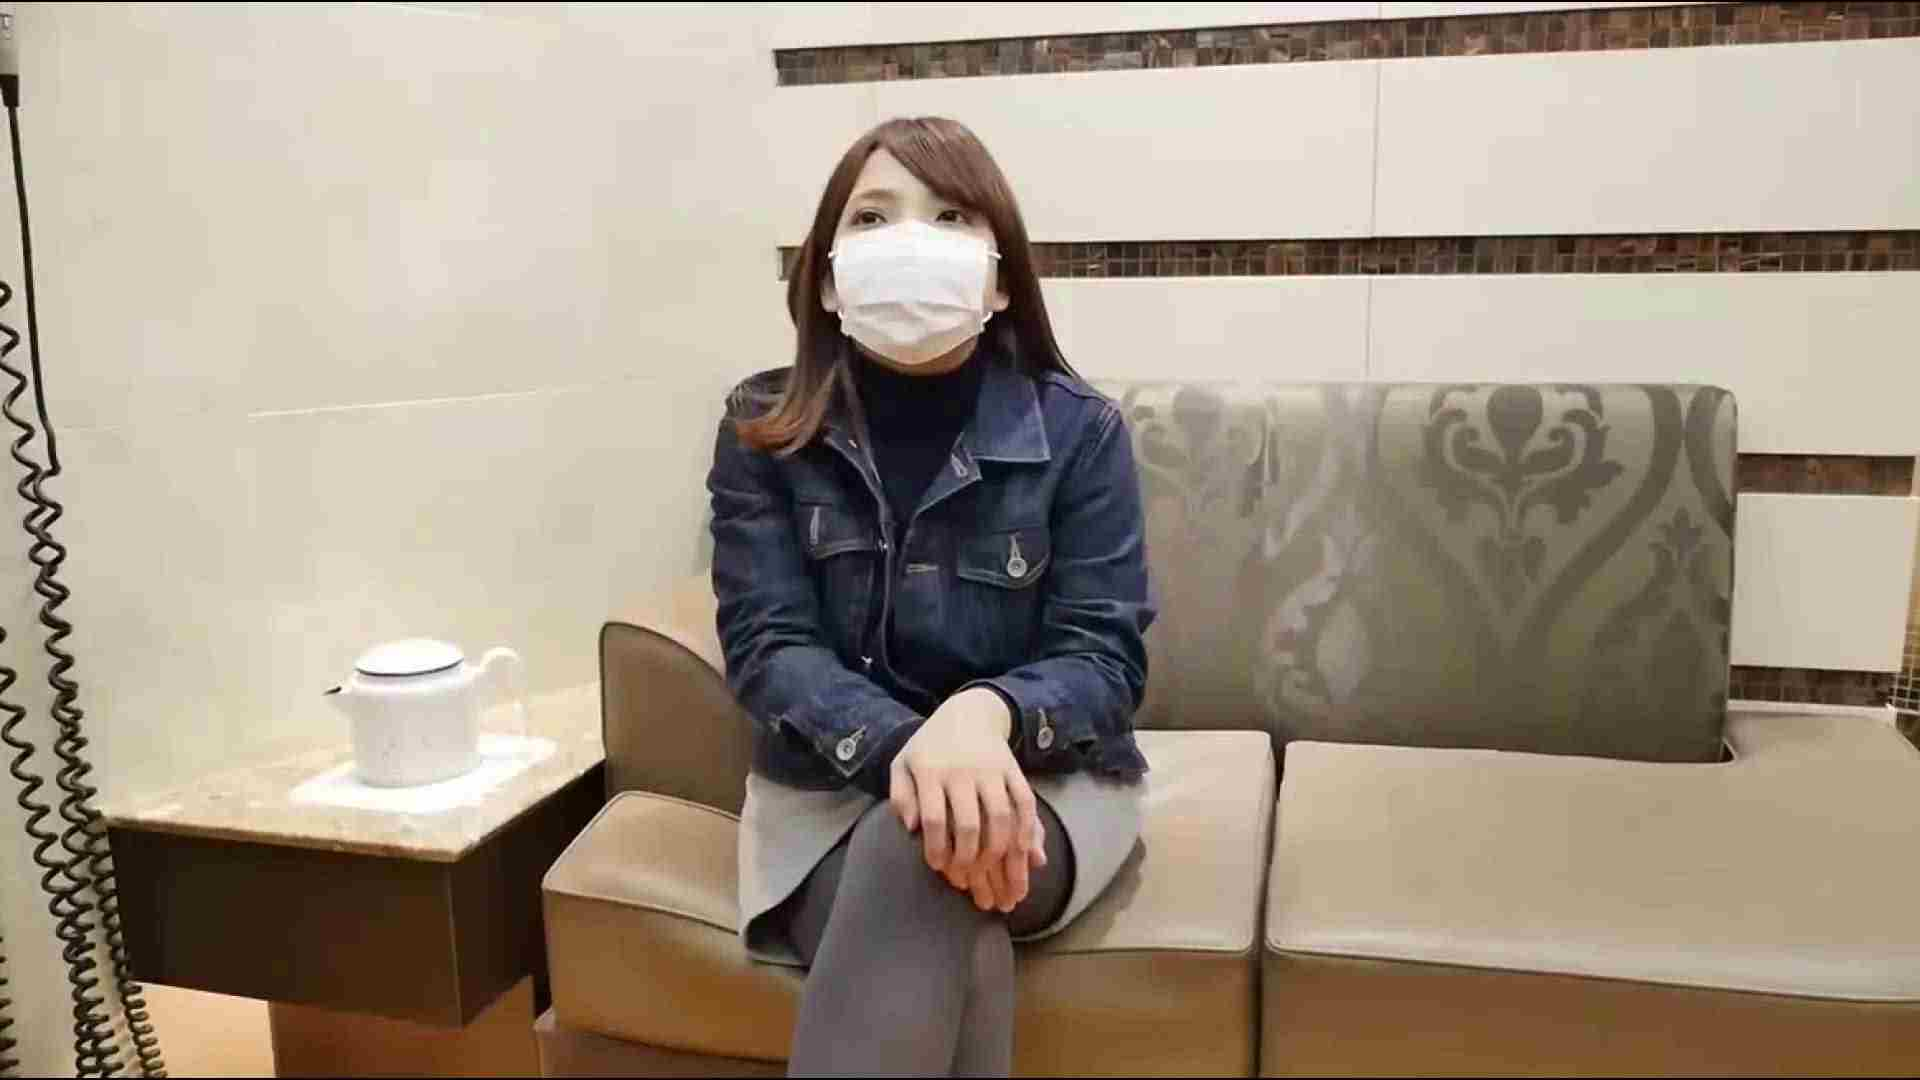 S級厳選美女ビッチガールVol.41 前編 美女 | OLの実態  83pic 25